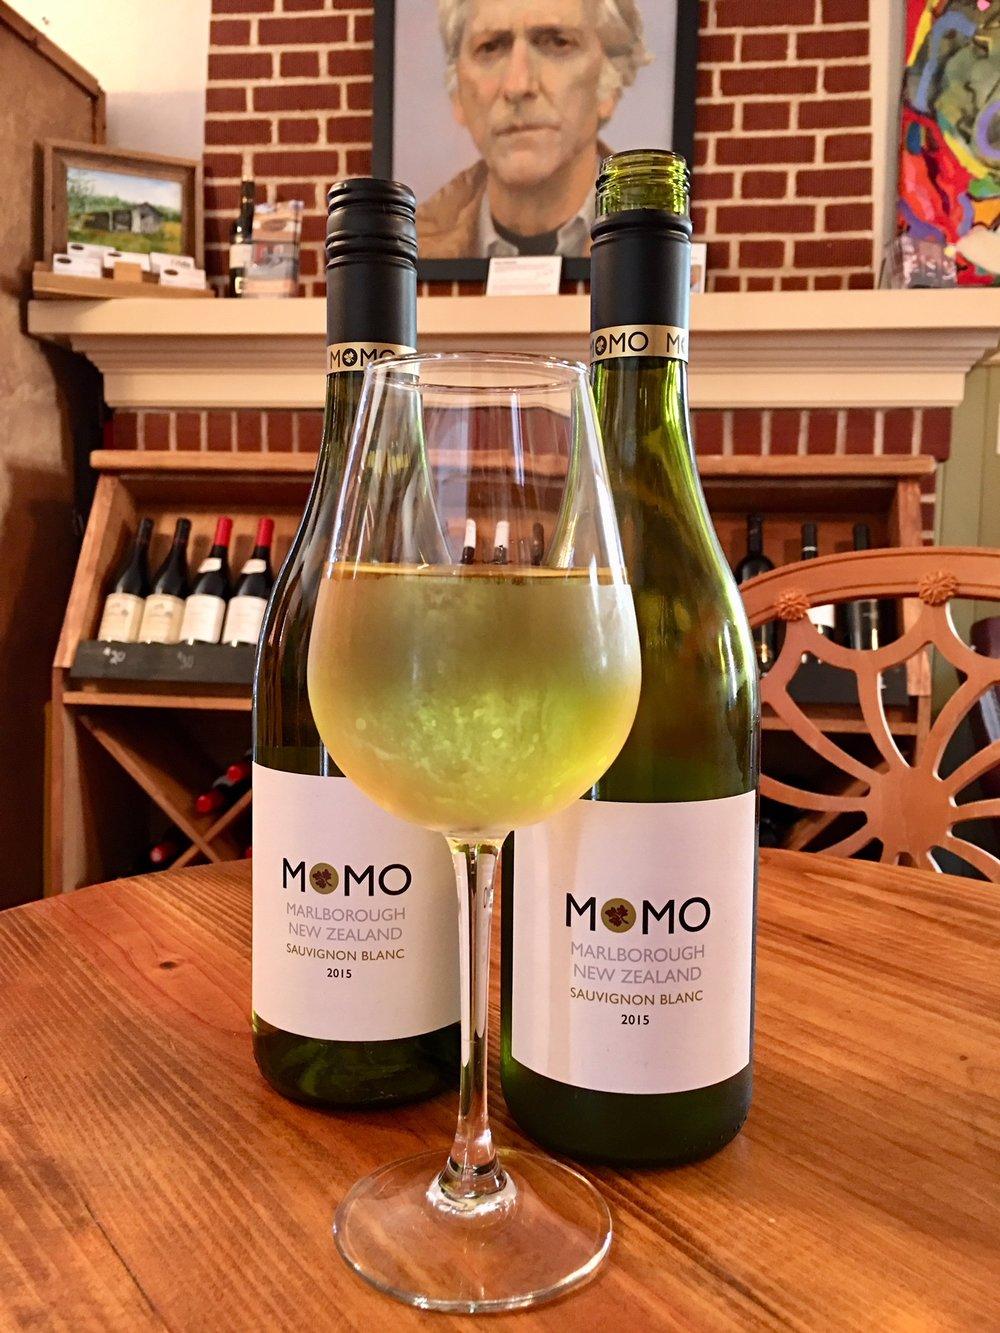 Momo New Zealand Sauvignon Blanc.jpg